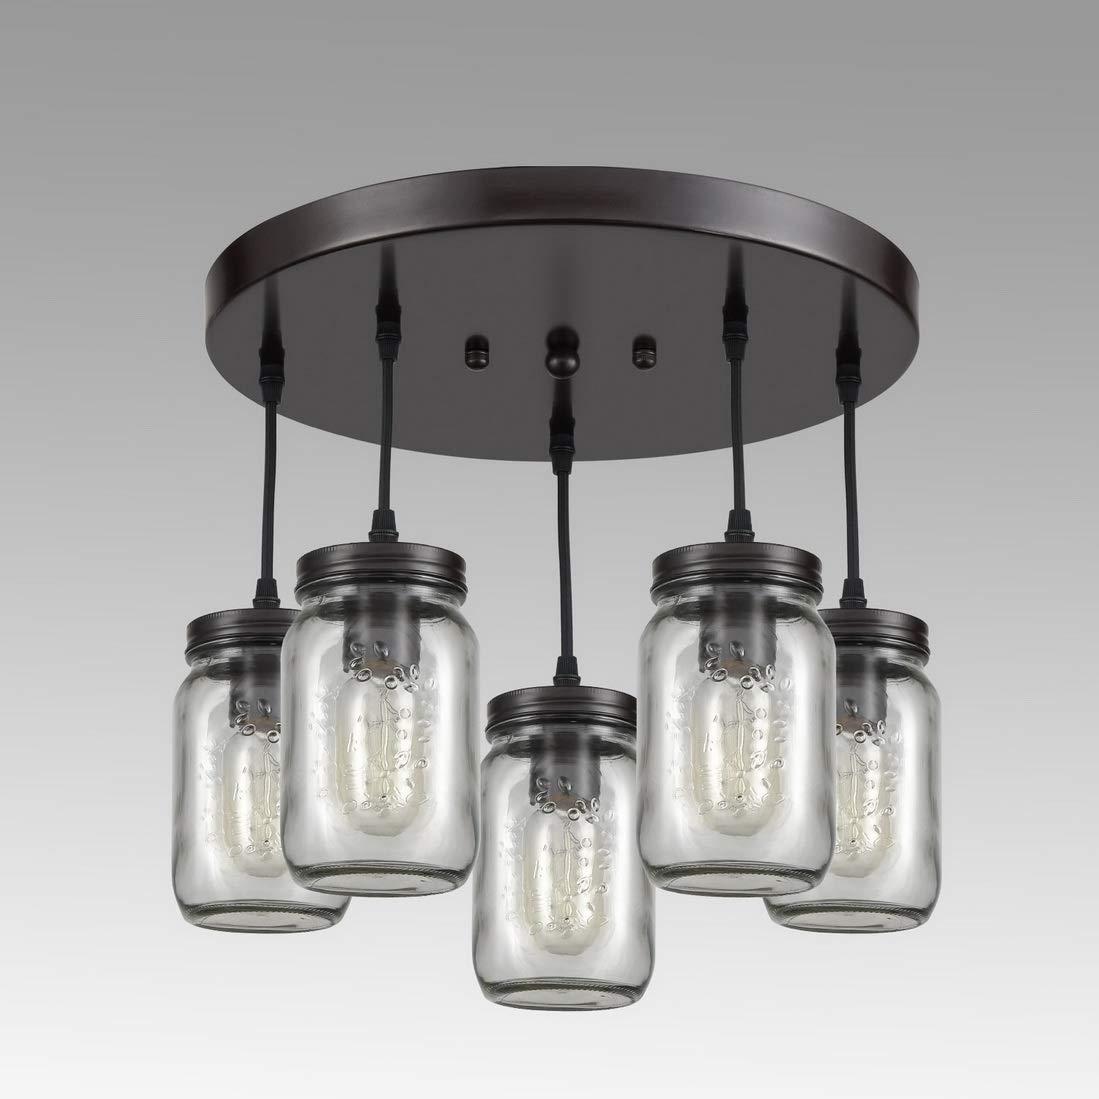 Amazon com eul rustic mason jar semi flush mount ceiling light 5 light pendant lighting fixture oil rubbed bronze home improvement